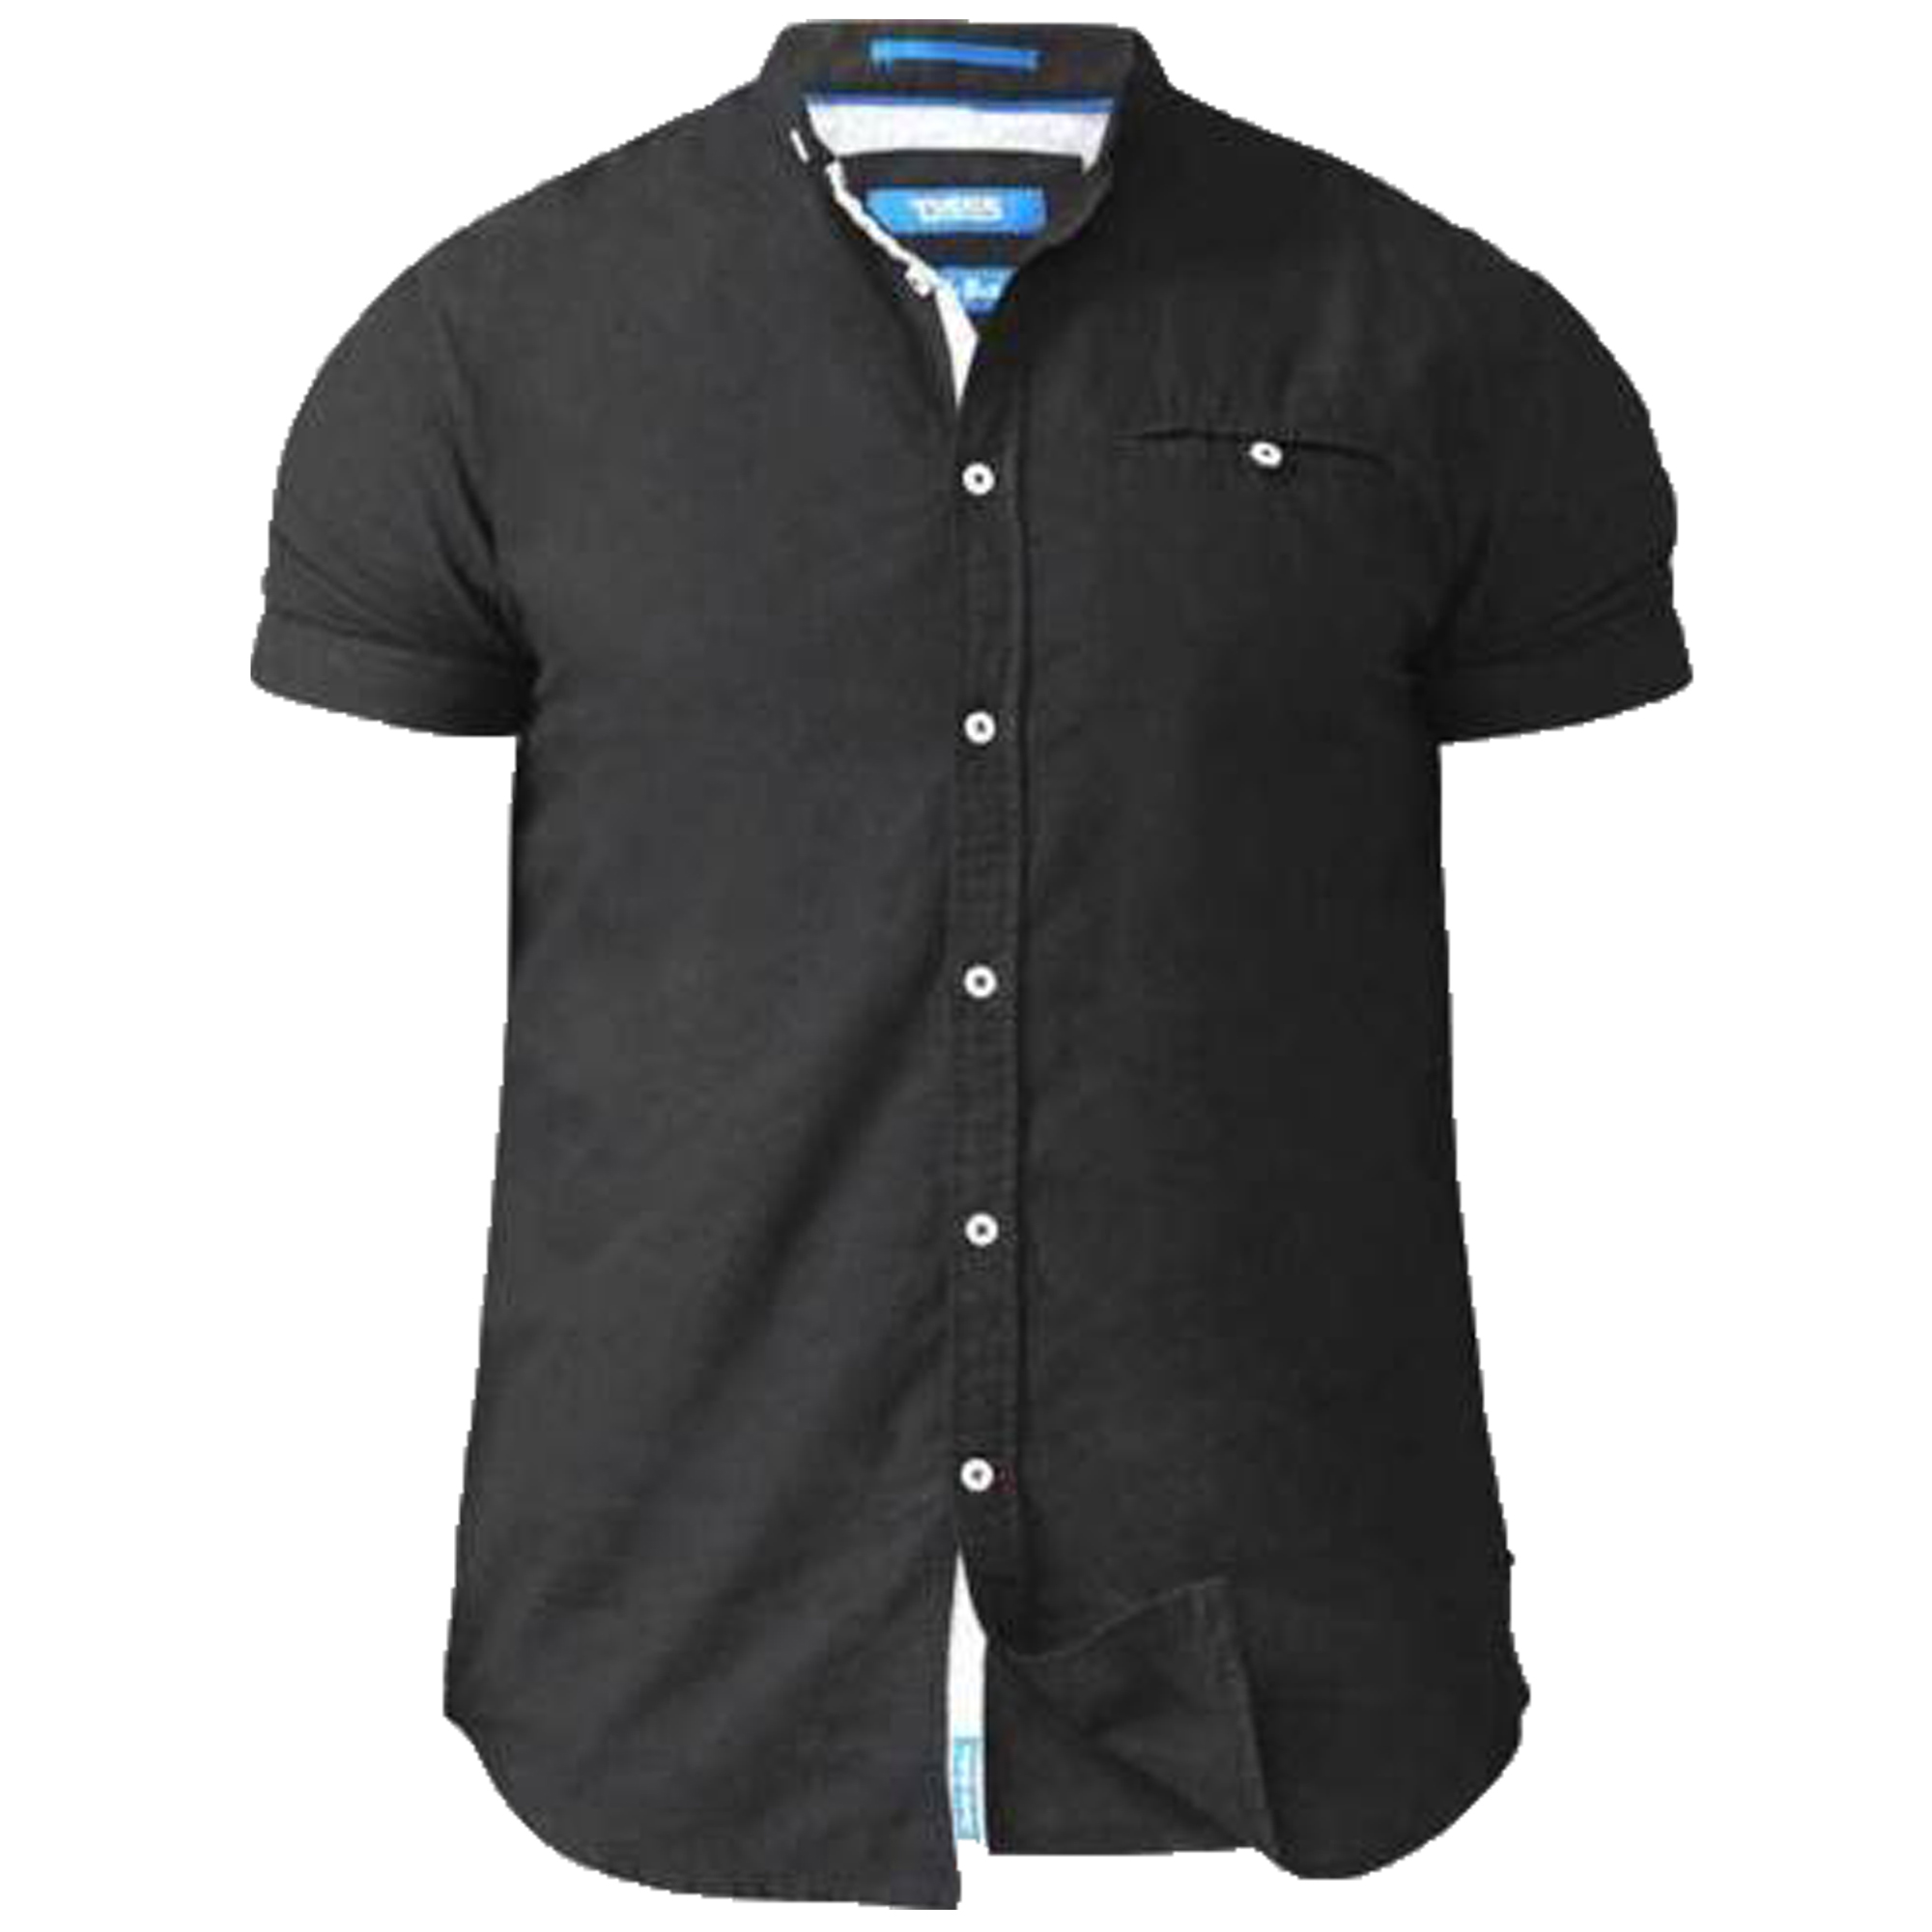 Camisa-Para-Hombres-D555-Duke-Algodon-Oxford-Big-King-Size-Dwight-Norman-de-Manga-Corta-Nuevo miniatura 2